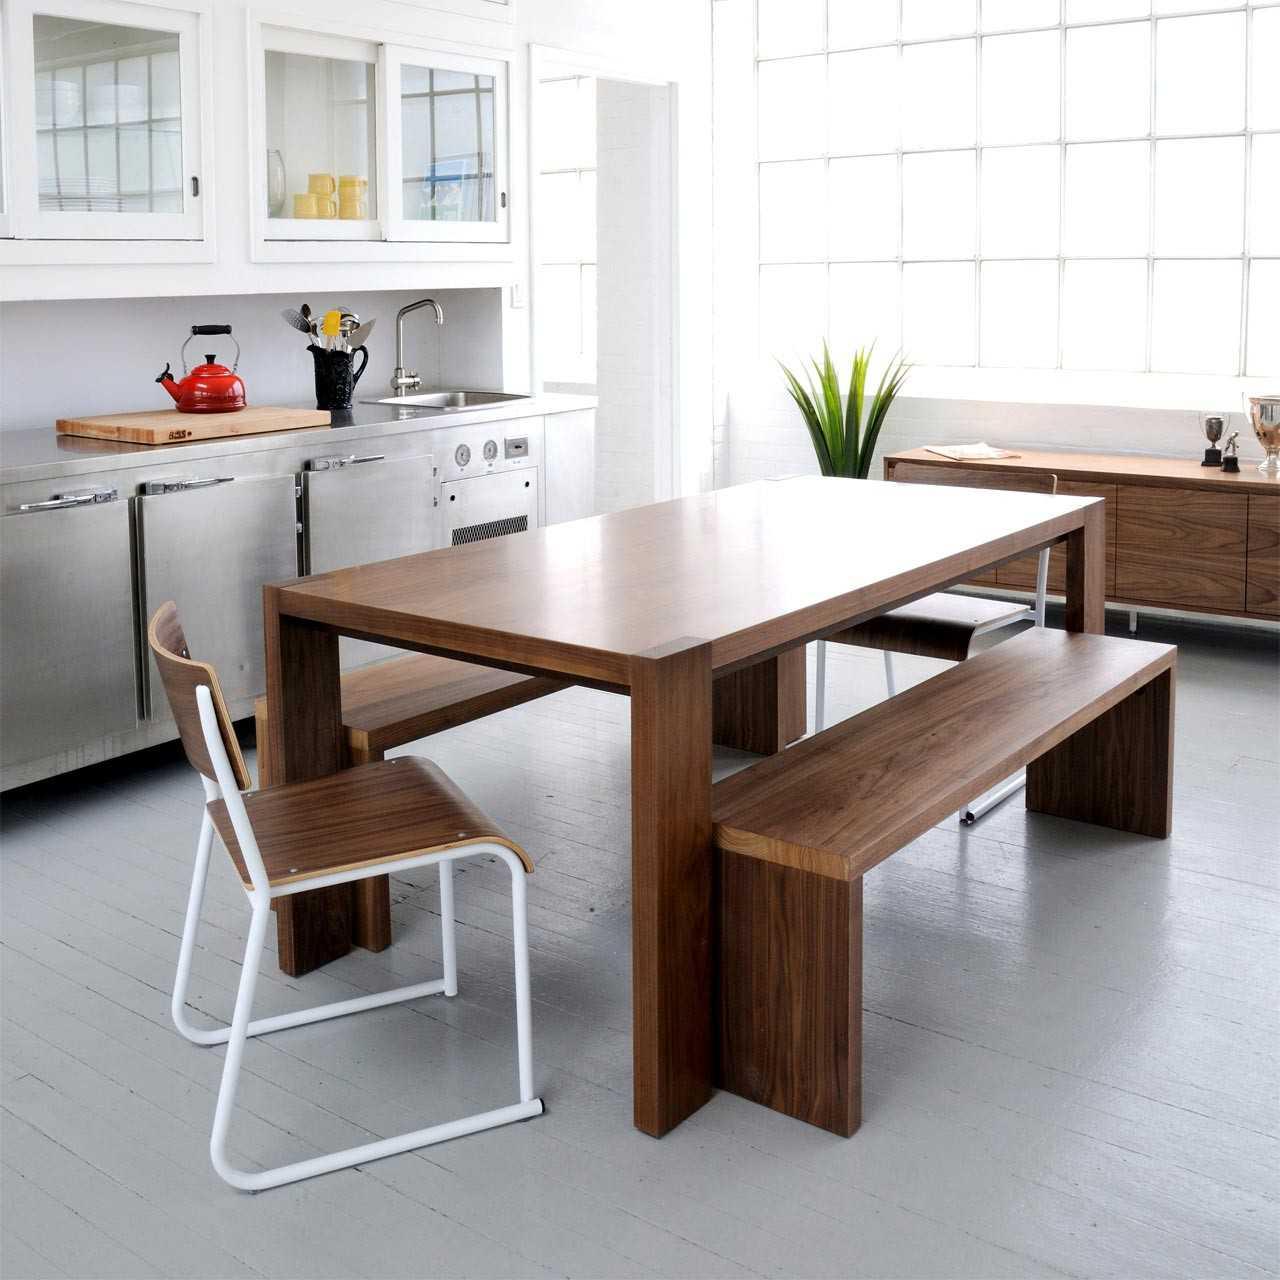 Meja Makan Minimalis Ruangan Kecil Decopoint Jogja Meja makan kecil minimalis